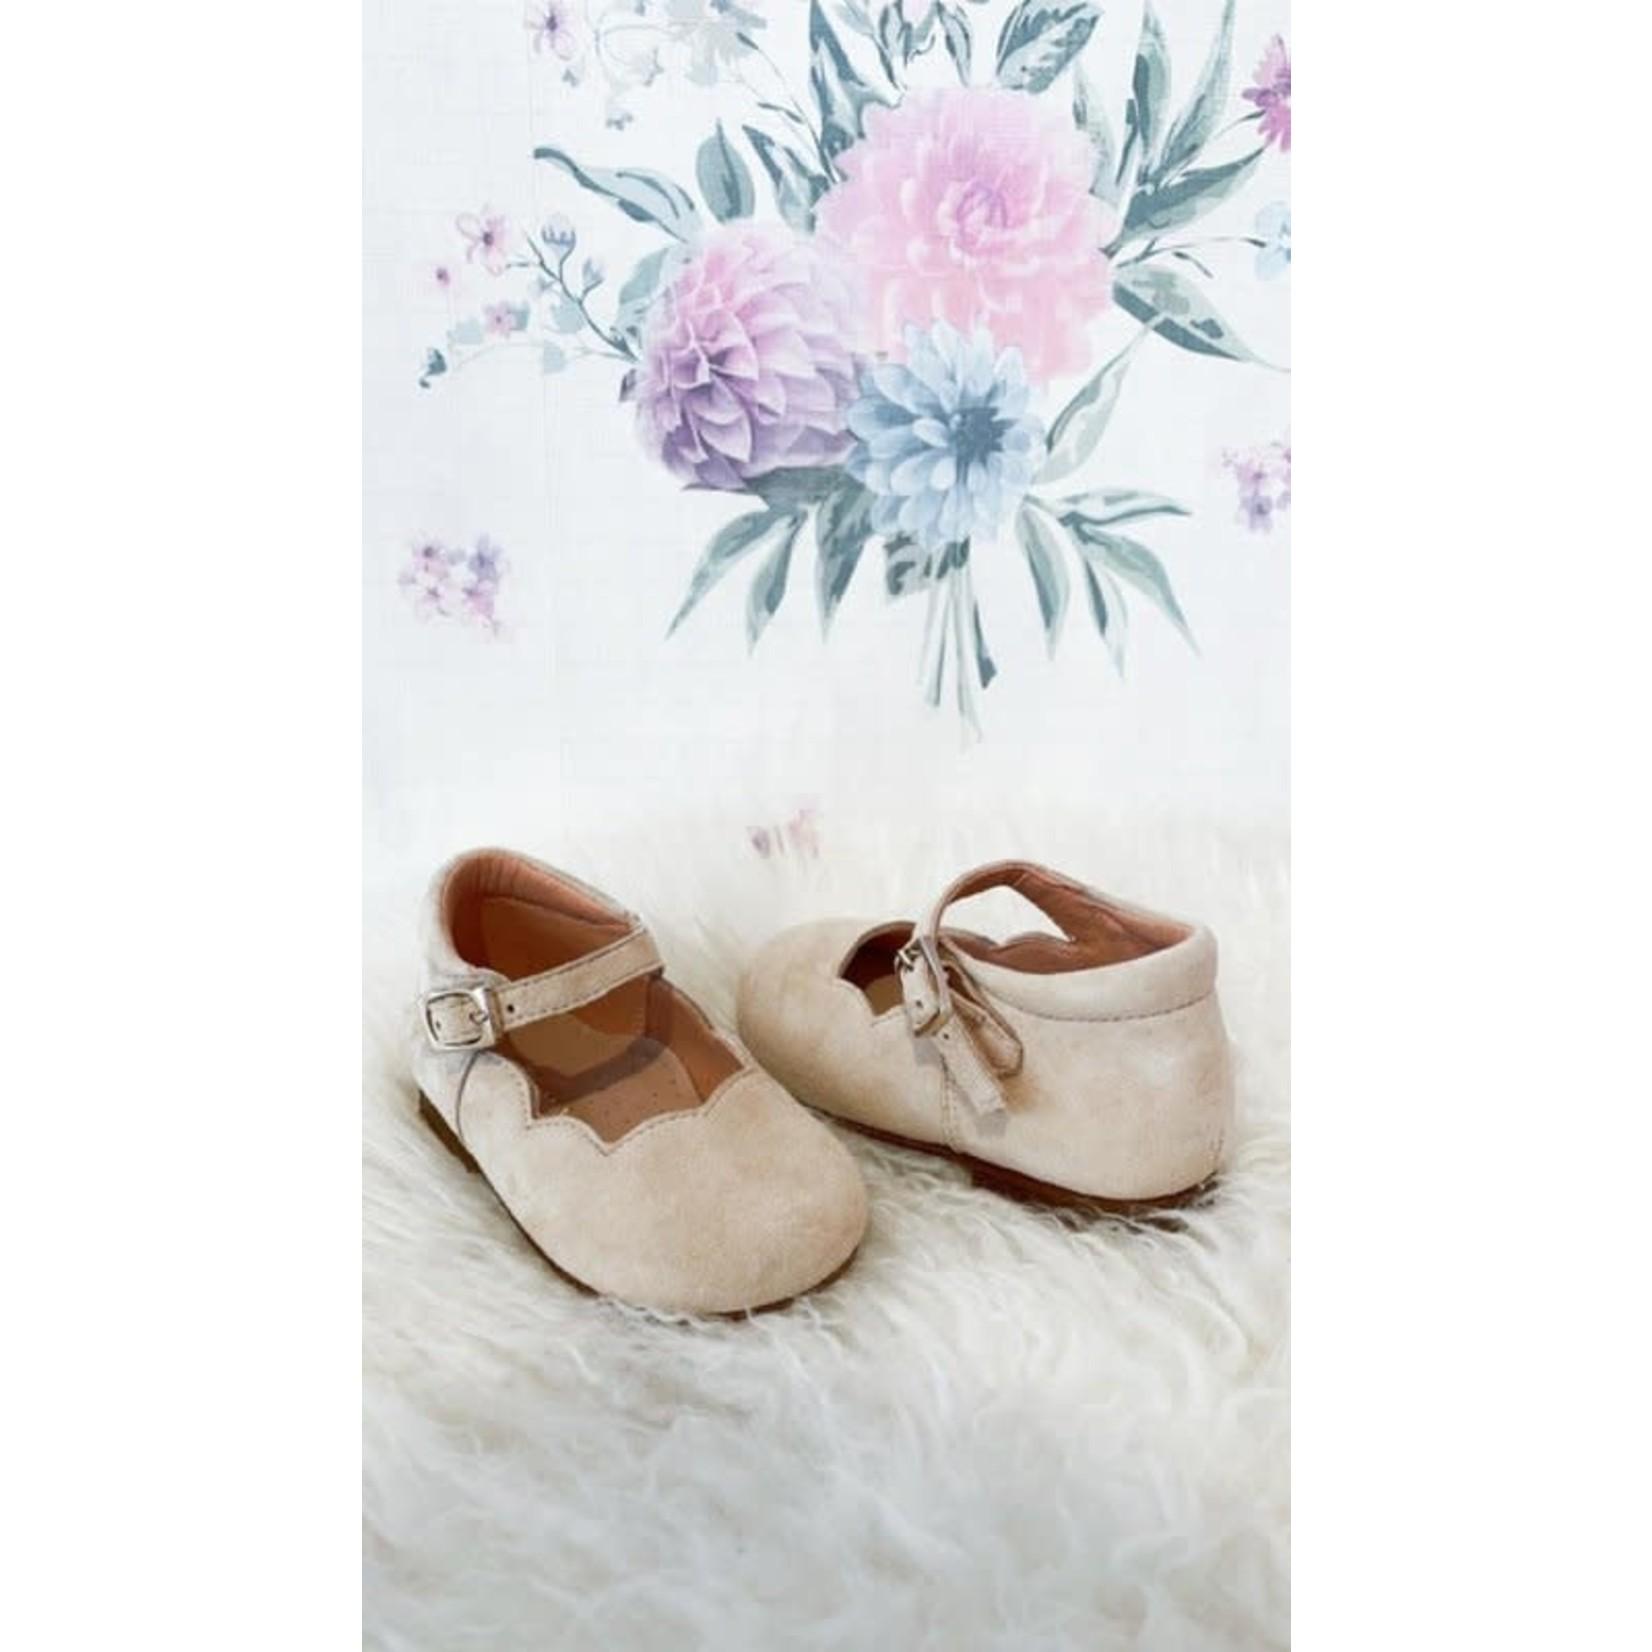 Clarys Shoes Suede Beige